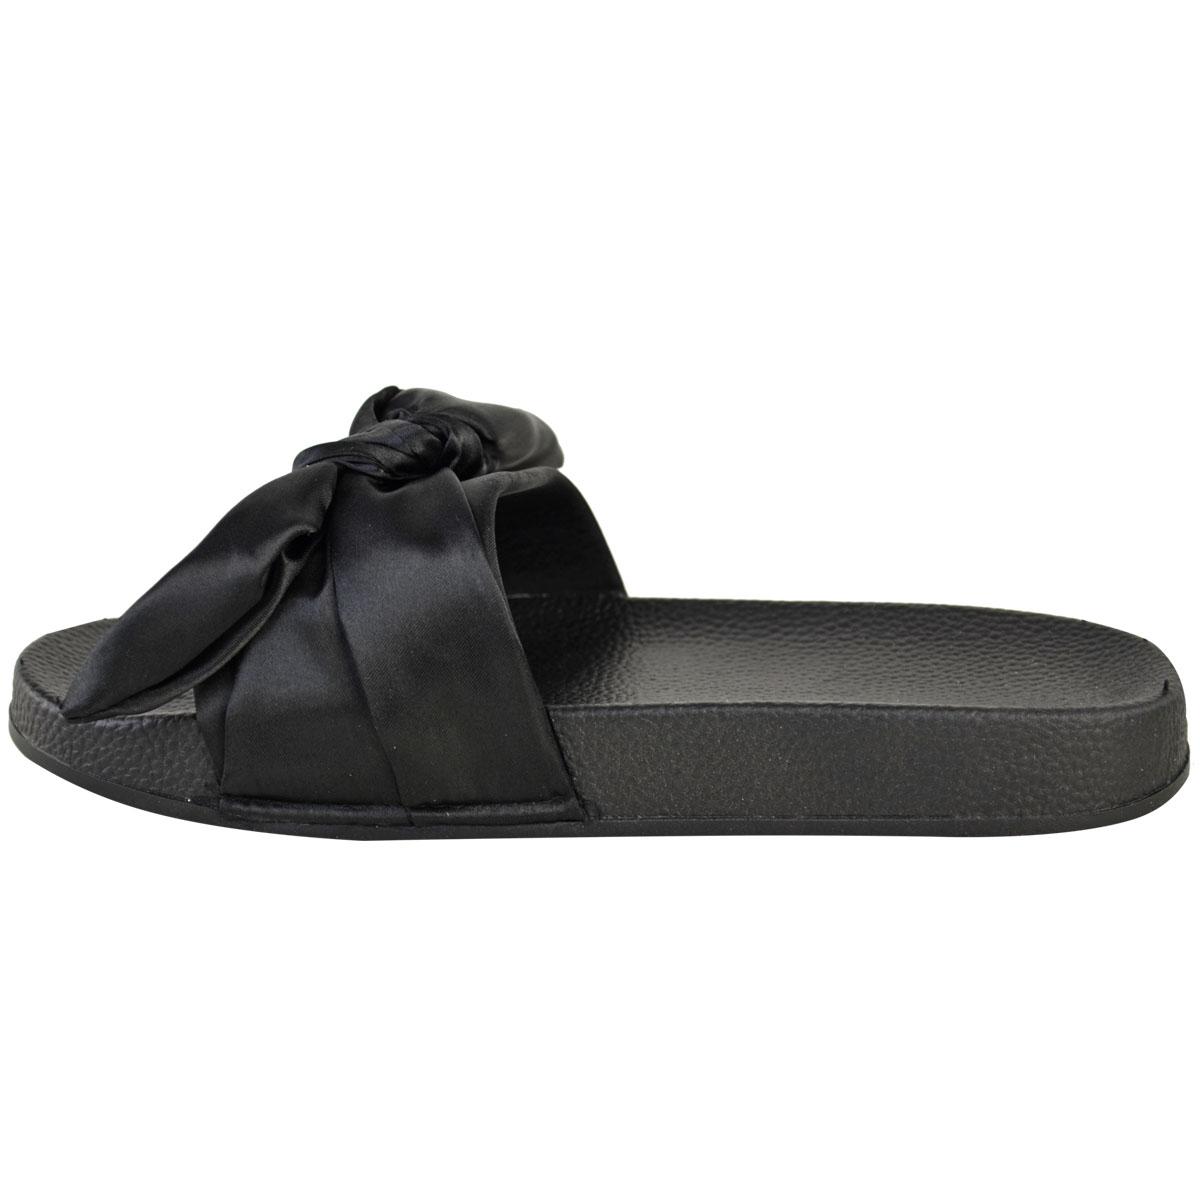 4dd998e64dfcba Womens Ladies Bow Sliders Sandals Flat Comfy Slides Slippers Satin ...